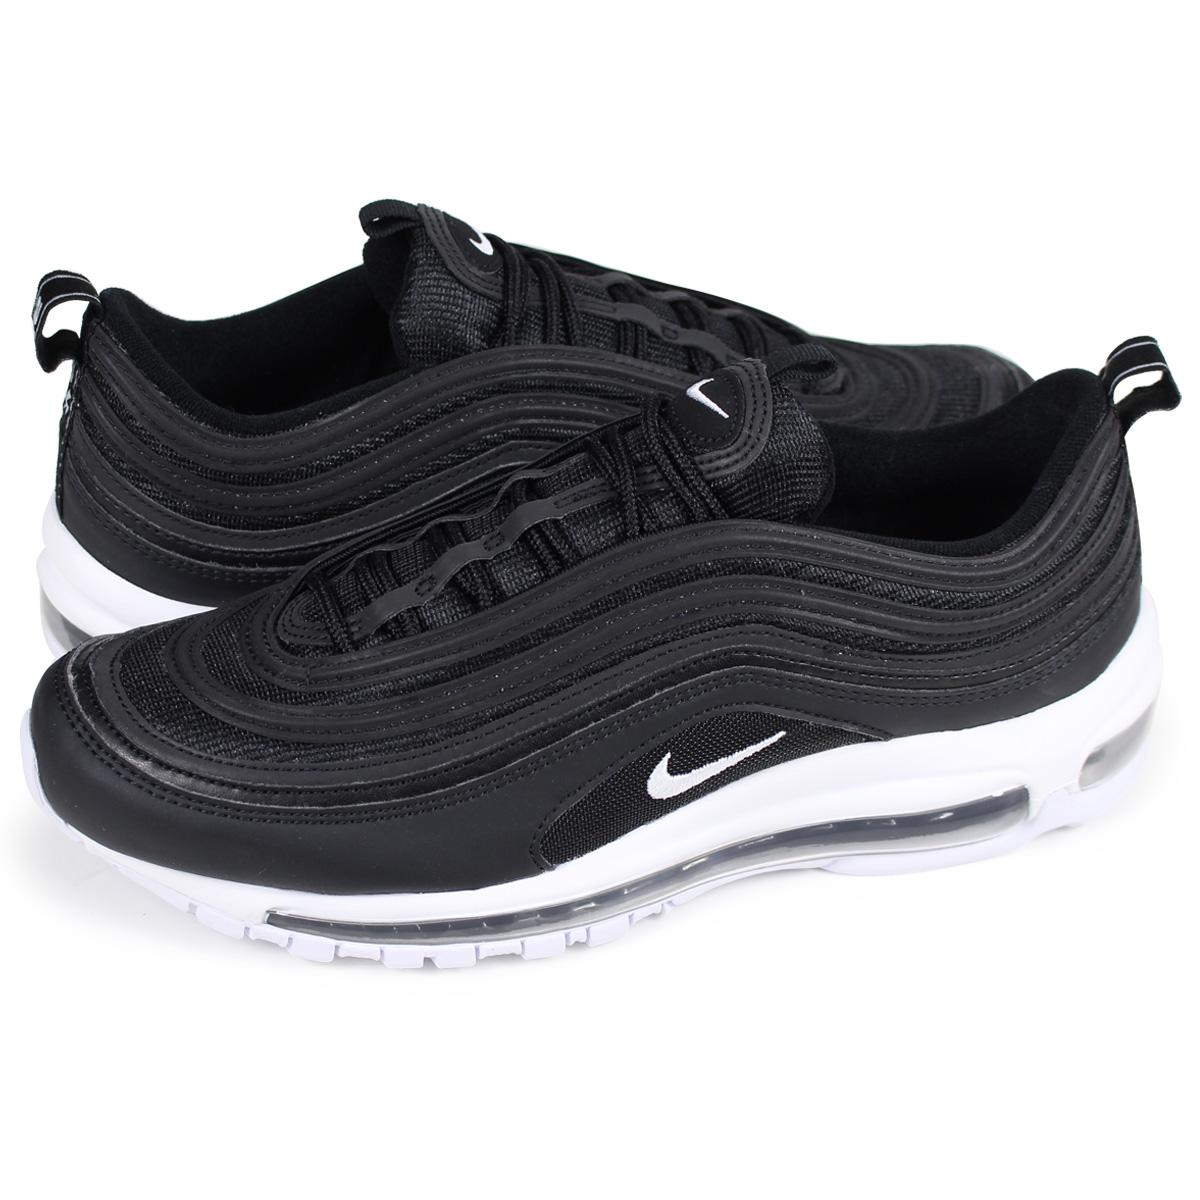 Nike NIKE Air Max 97 sneakers men AIR MAX 97 921,826 001 black black [the 1010 additional arrival]